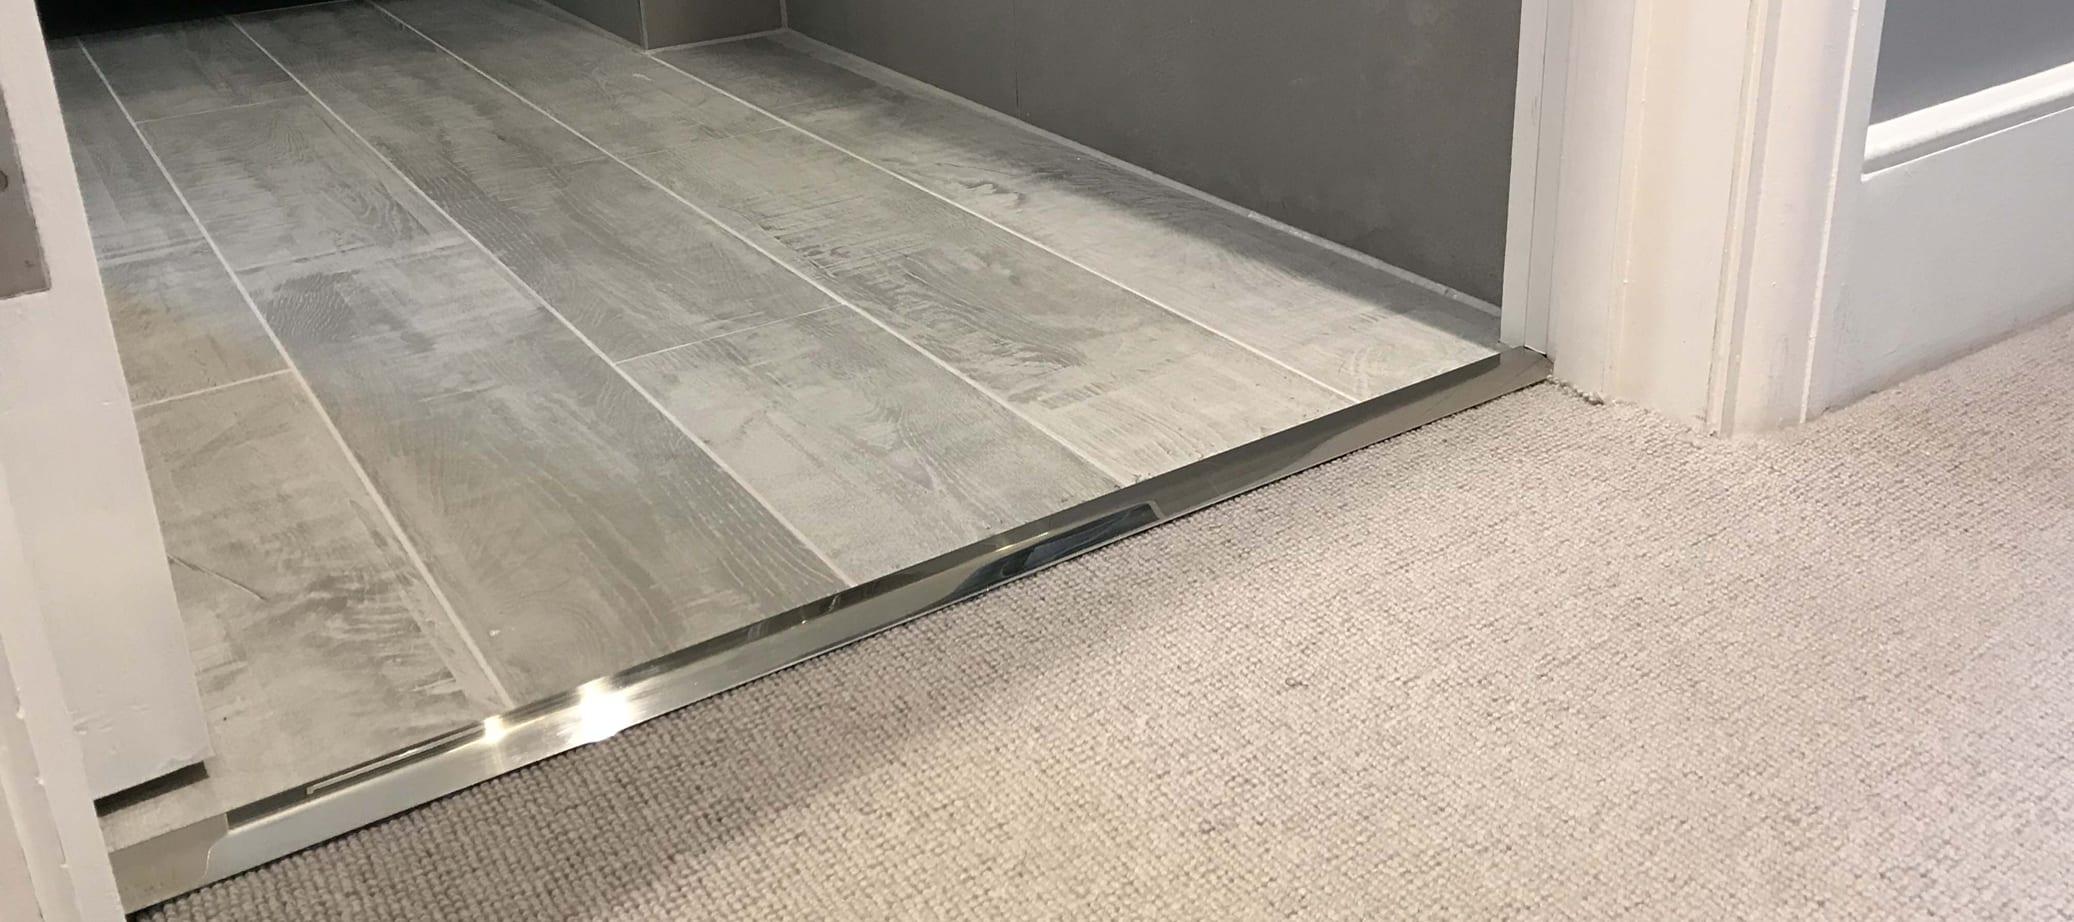 Button to carpet to lino door threshold in satin nickel